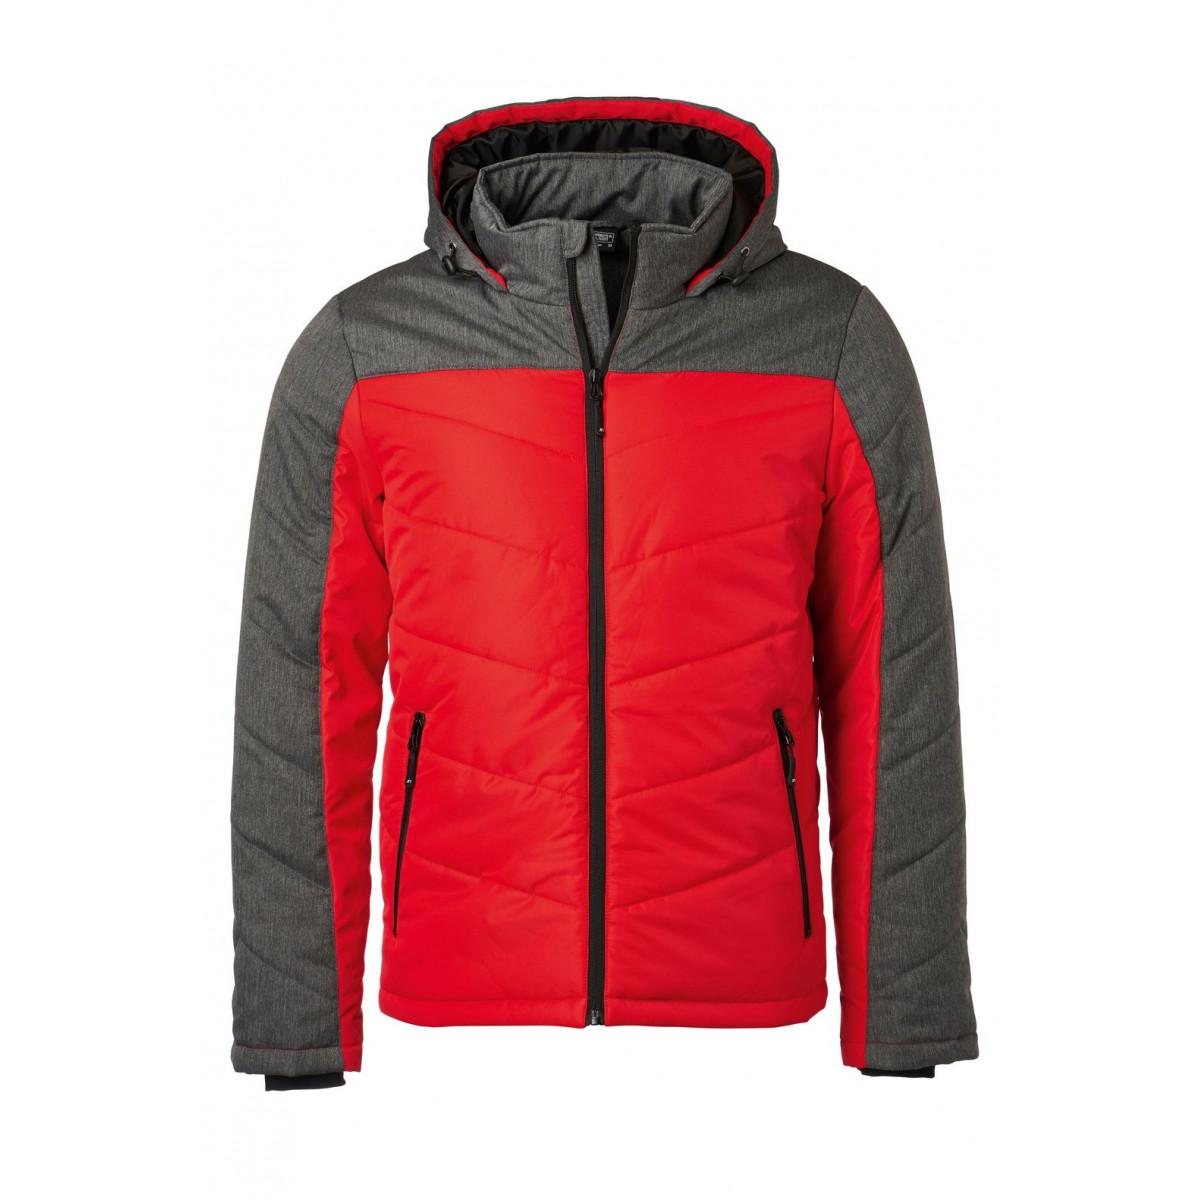 Куртка мужская JN1134 Mens Winter Jacket - Красный/Темно-серый меланж